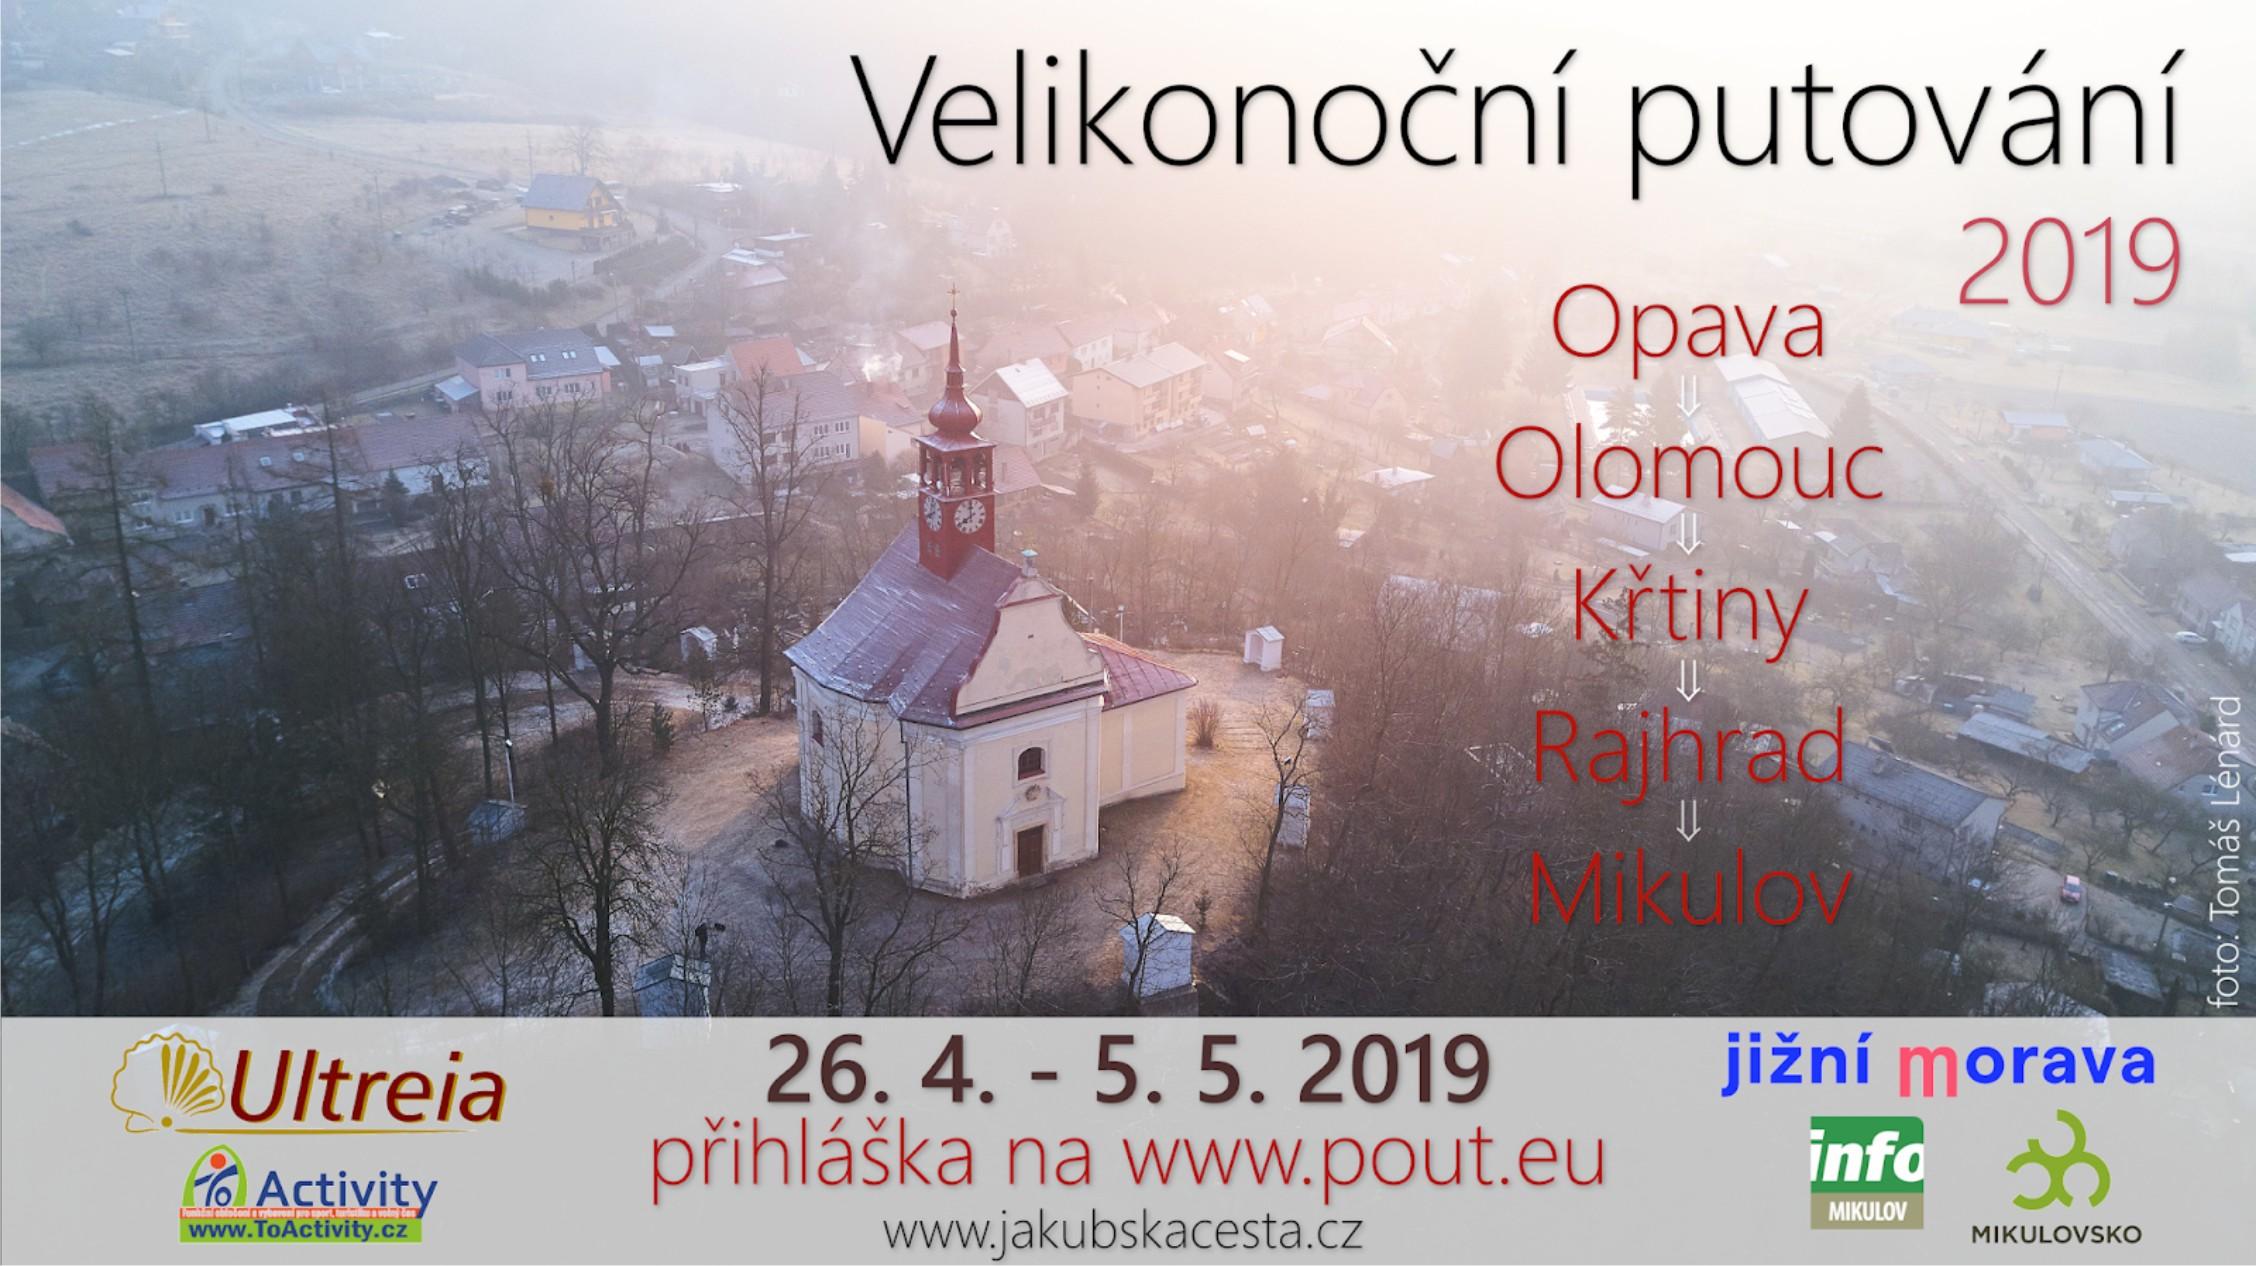 Cenk fotograf Brno, svatevnch fotografi, fotografick studio